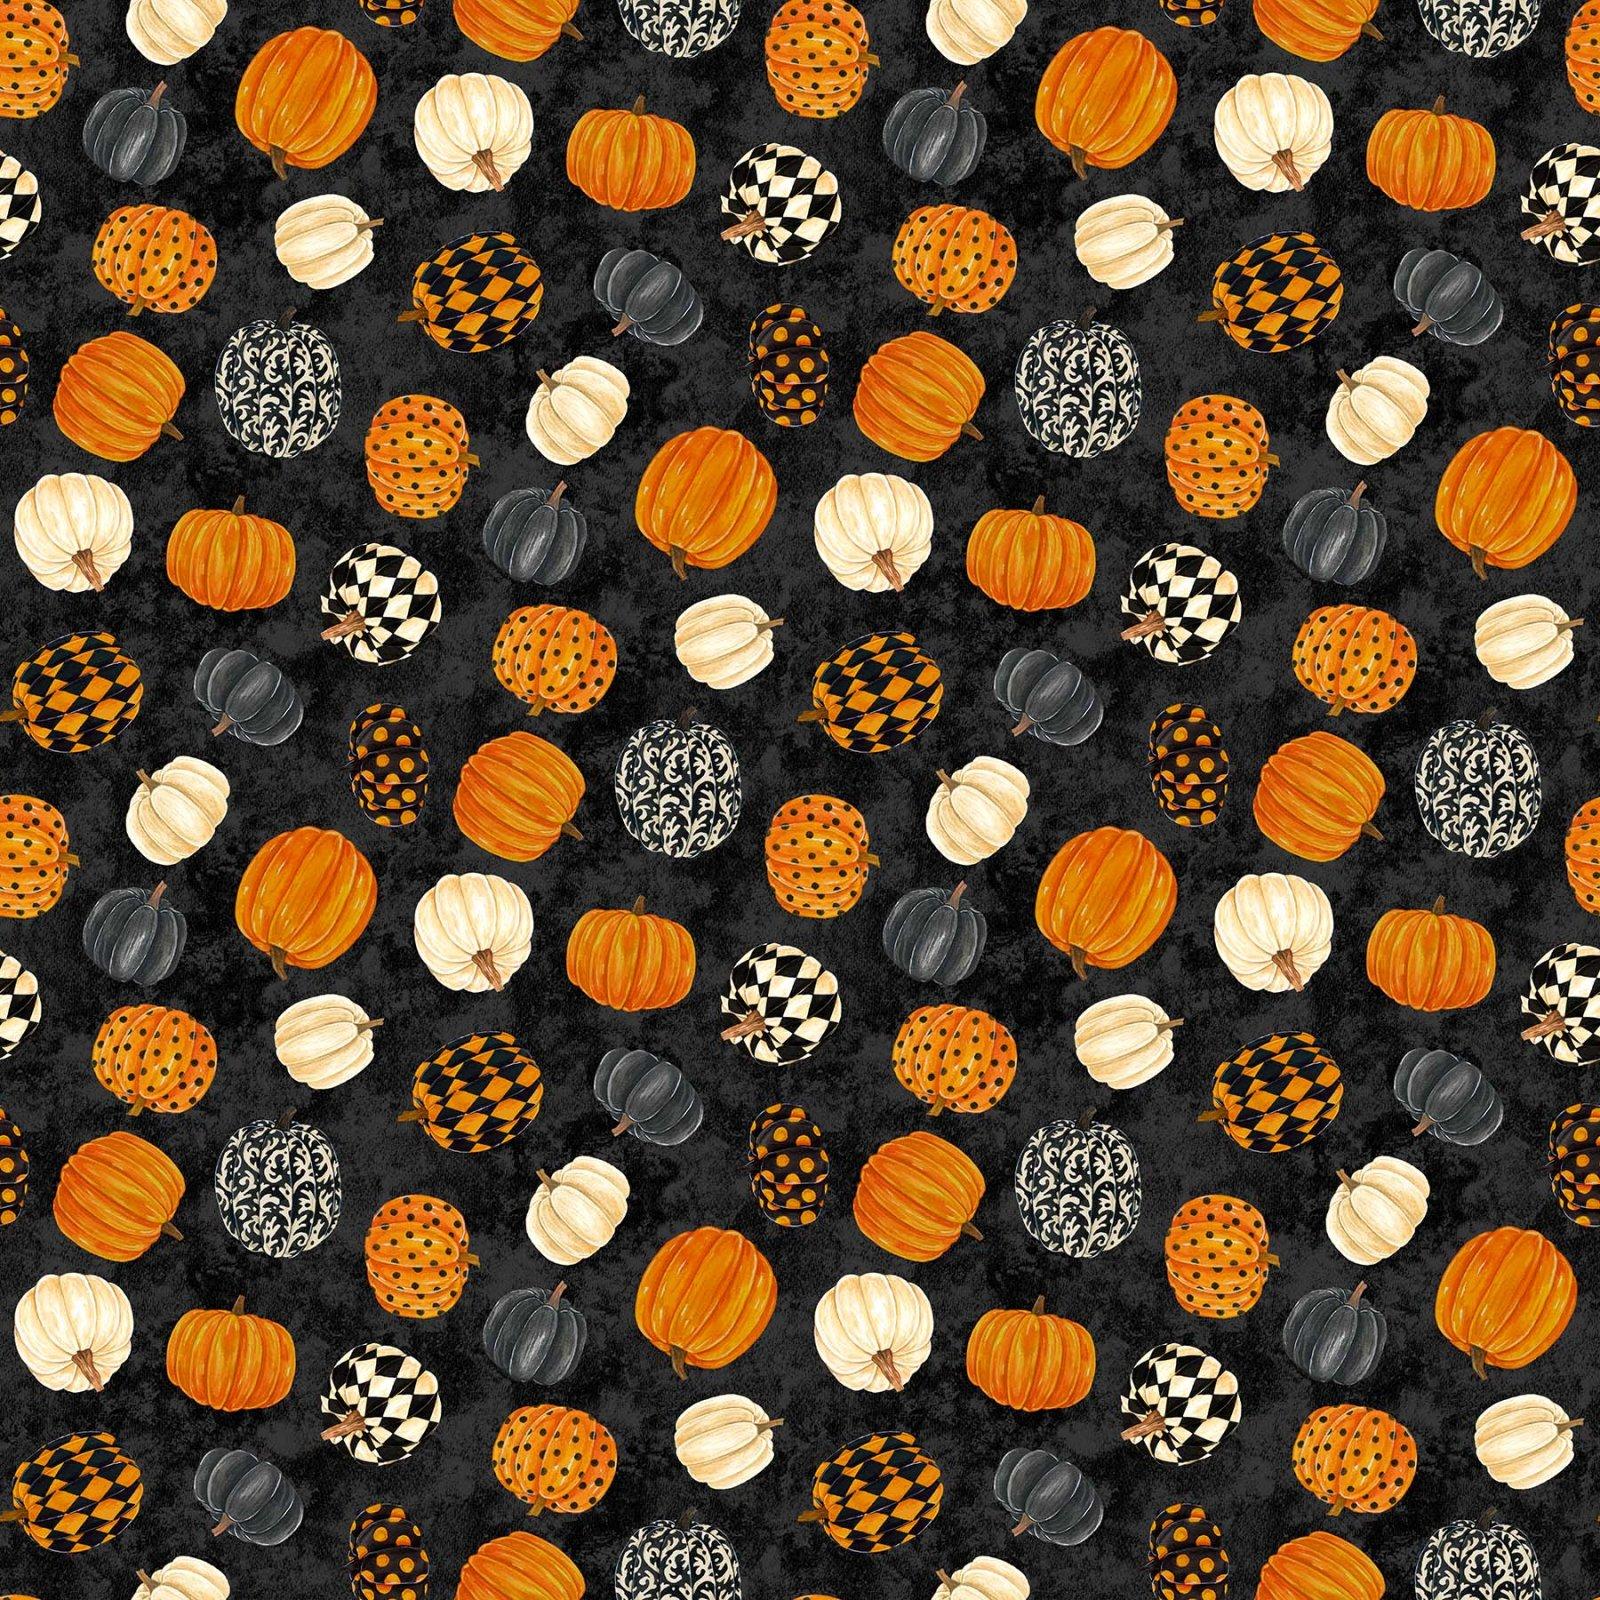 Black Cat Capers - Tossed Pumpkins